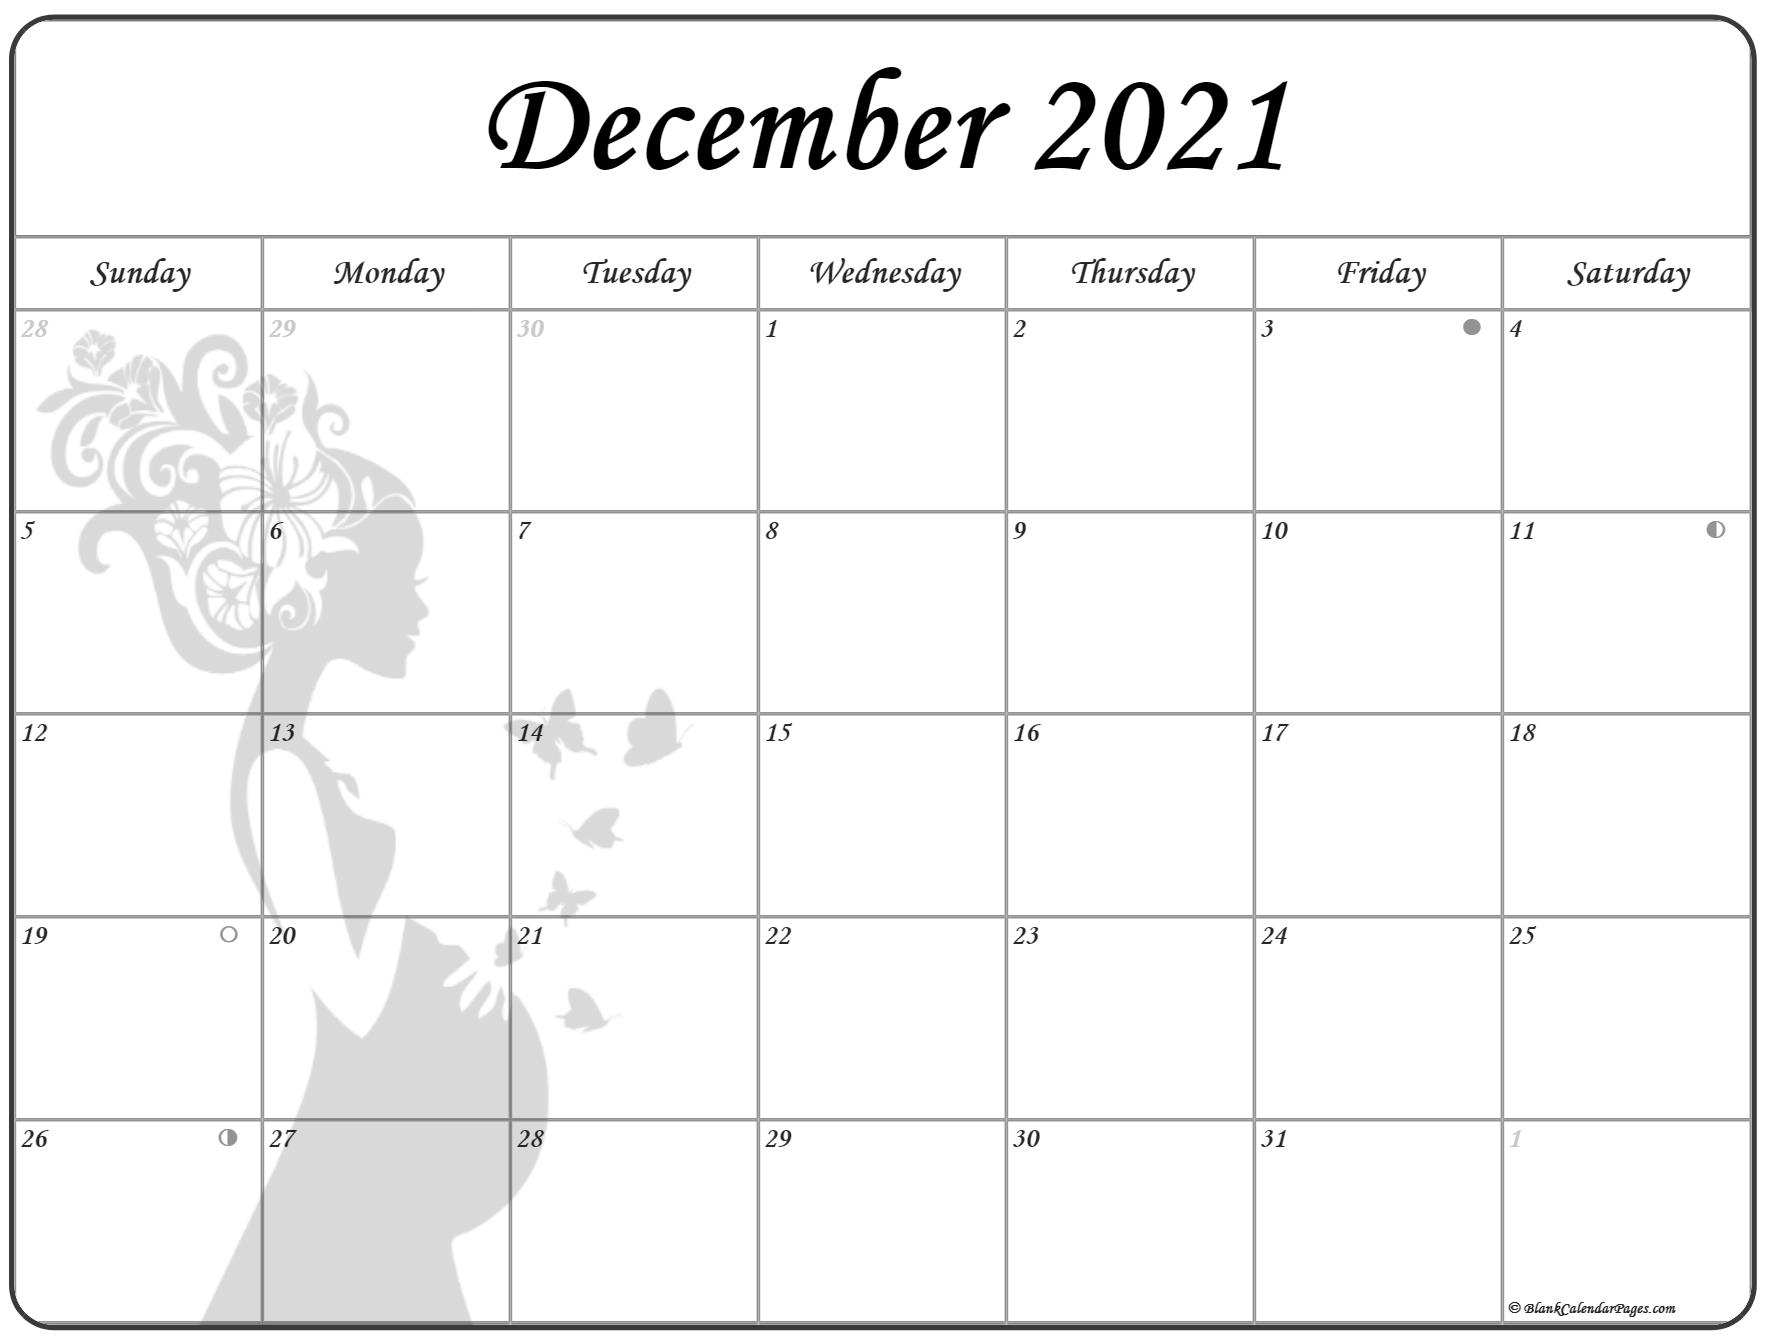 December 2021 Pregnancy Calendar   Fertility Calendar